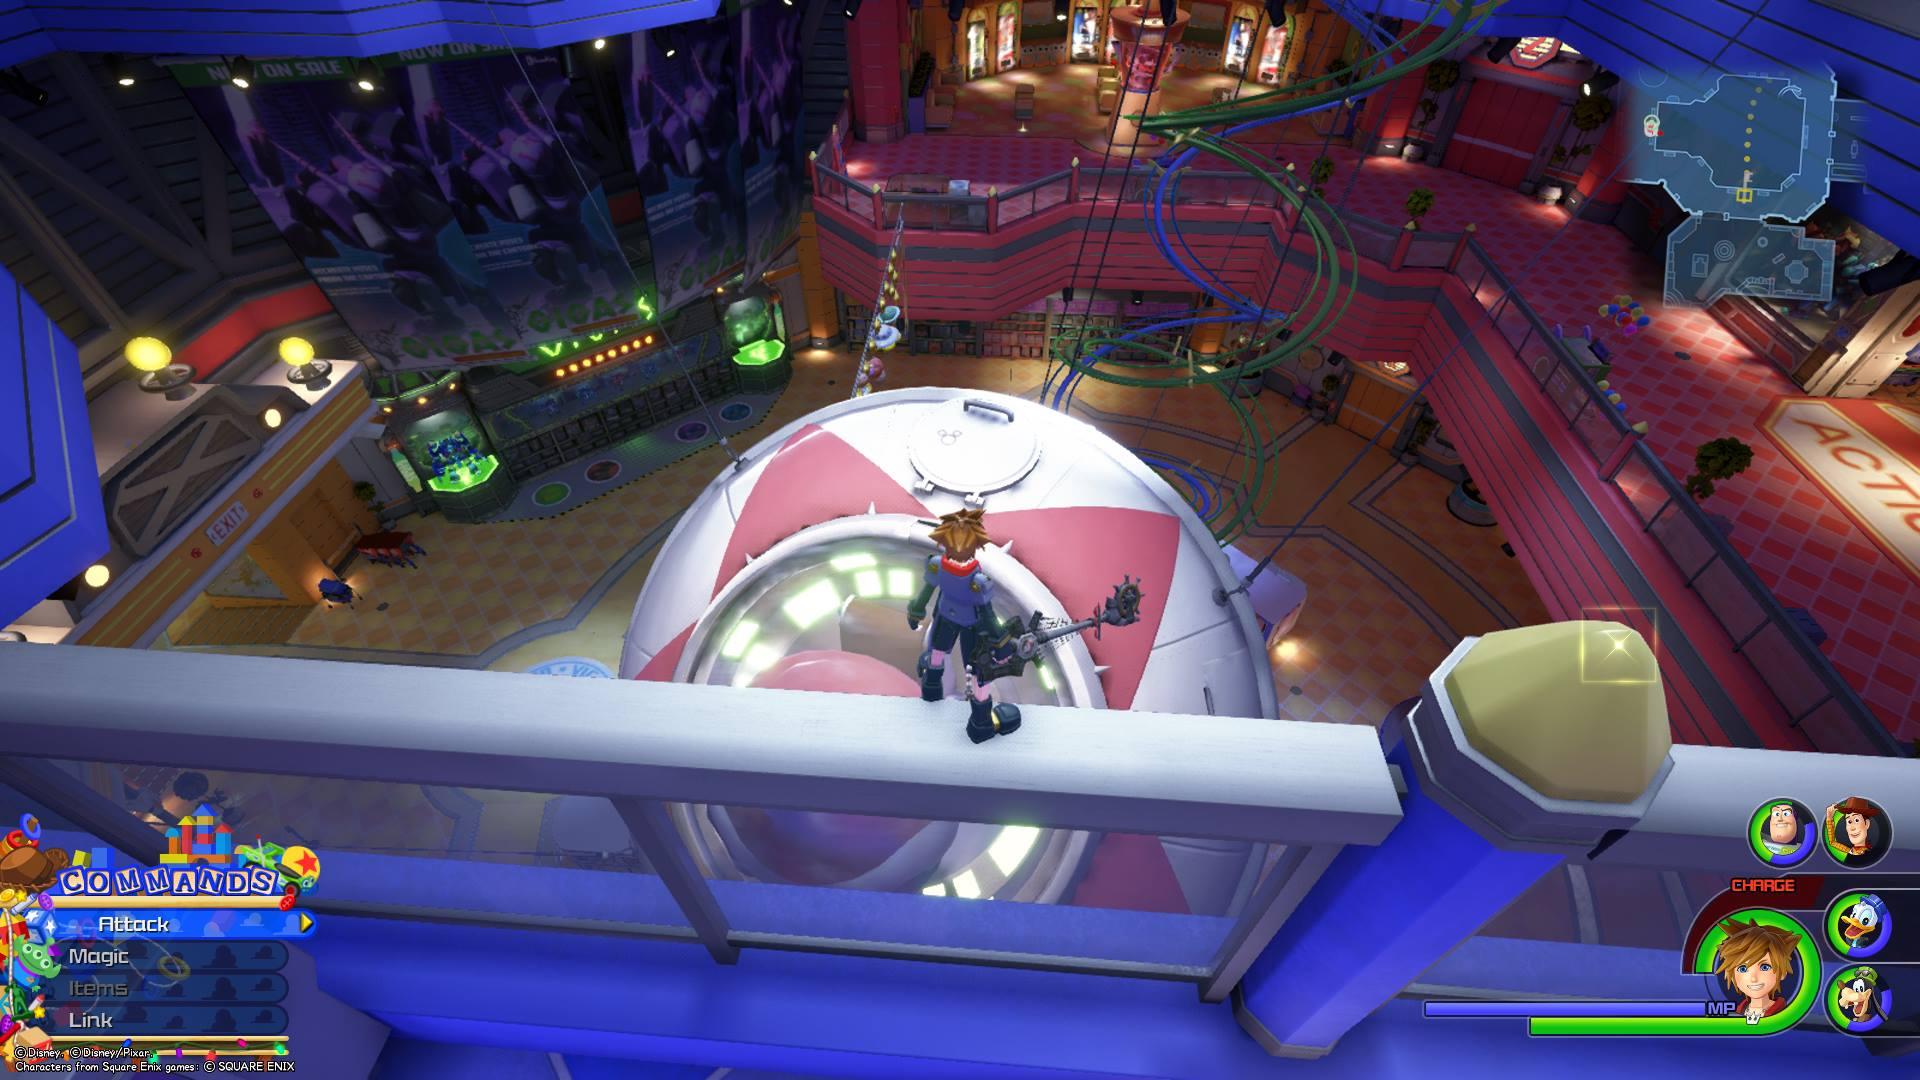 Kingdom Hearts 3 - Toy Box Lucky Emblem 9